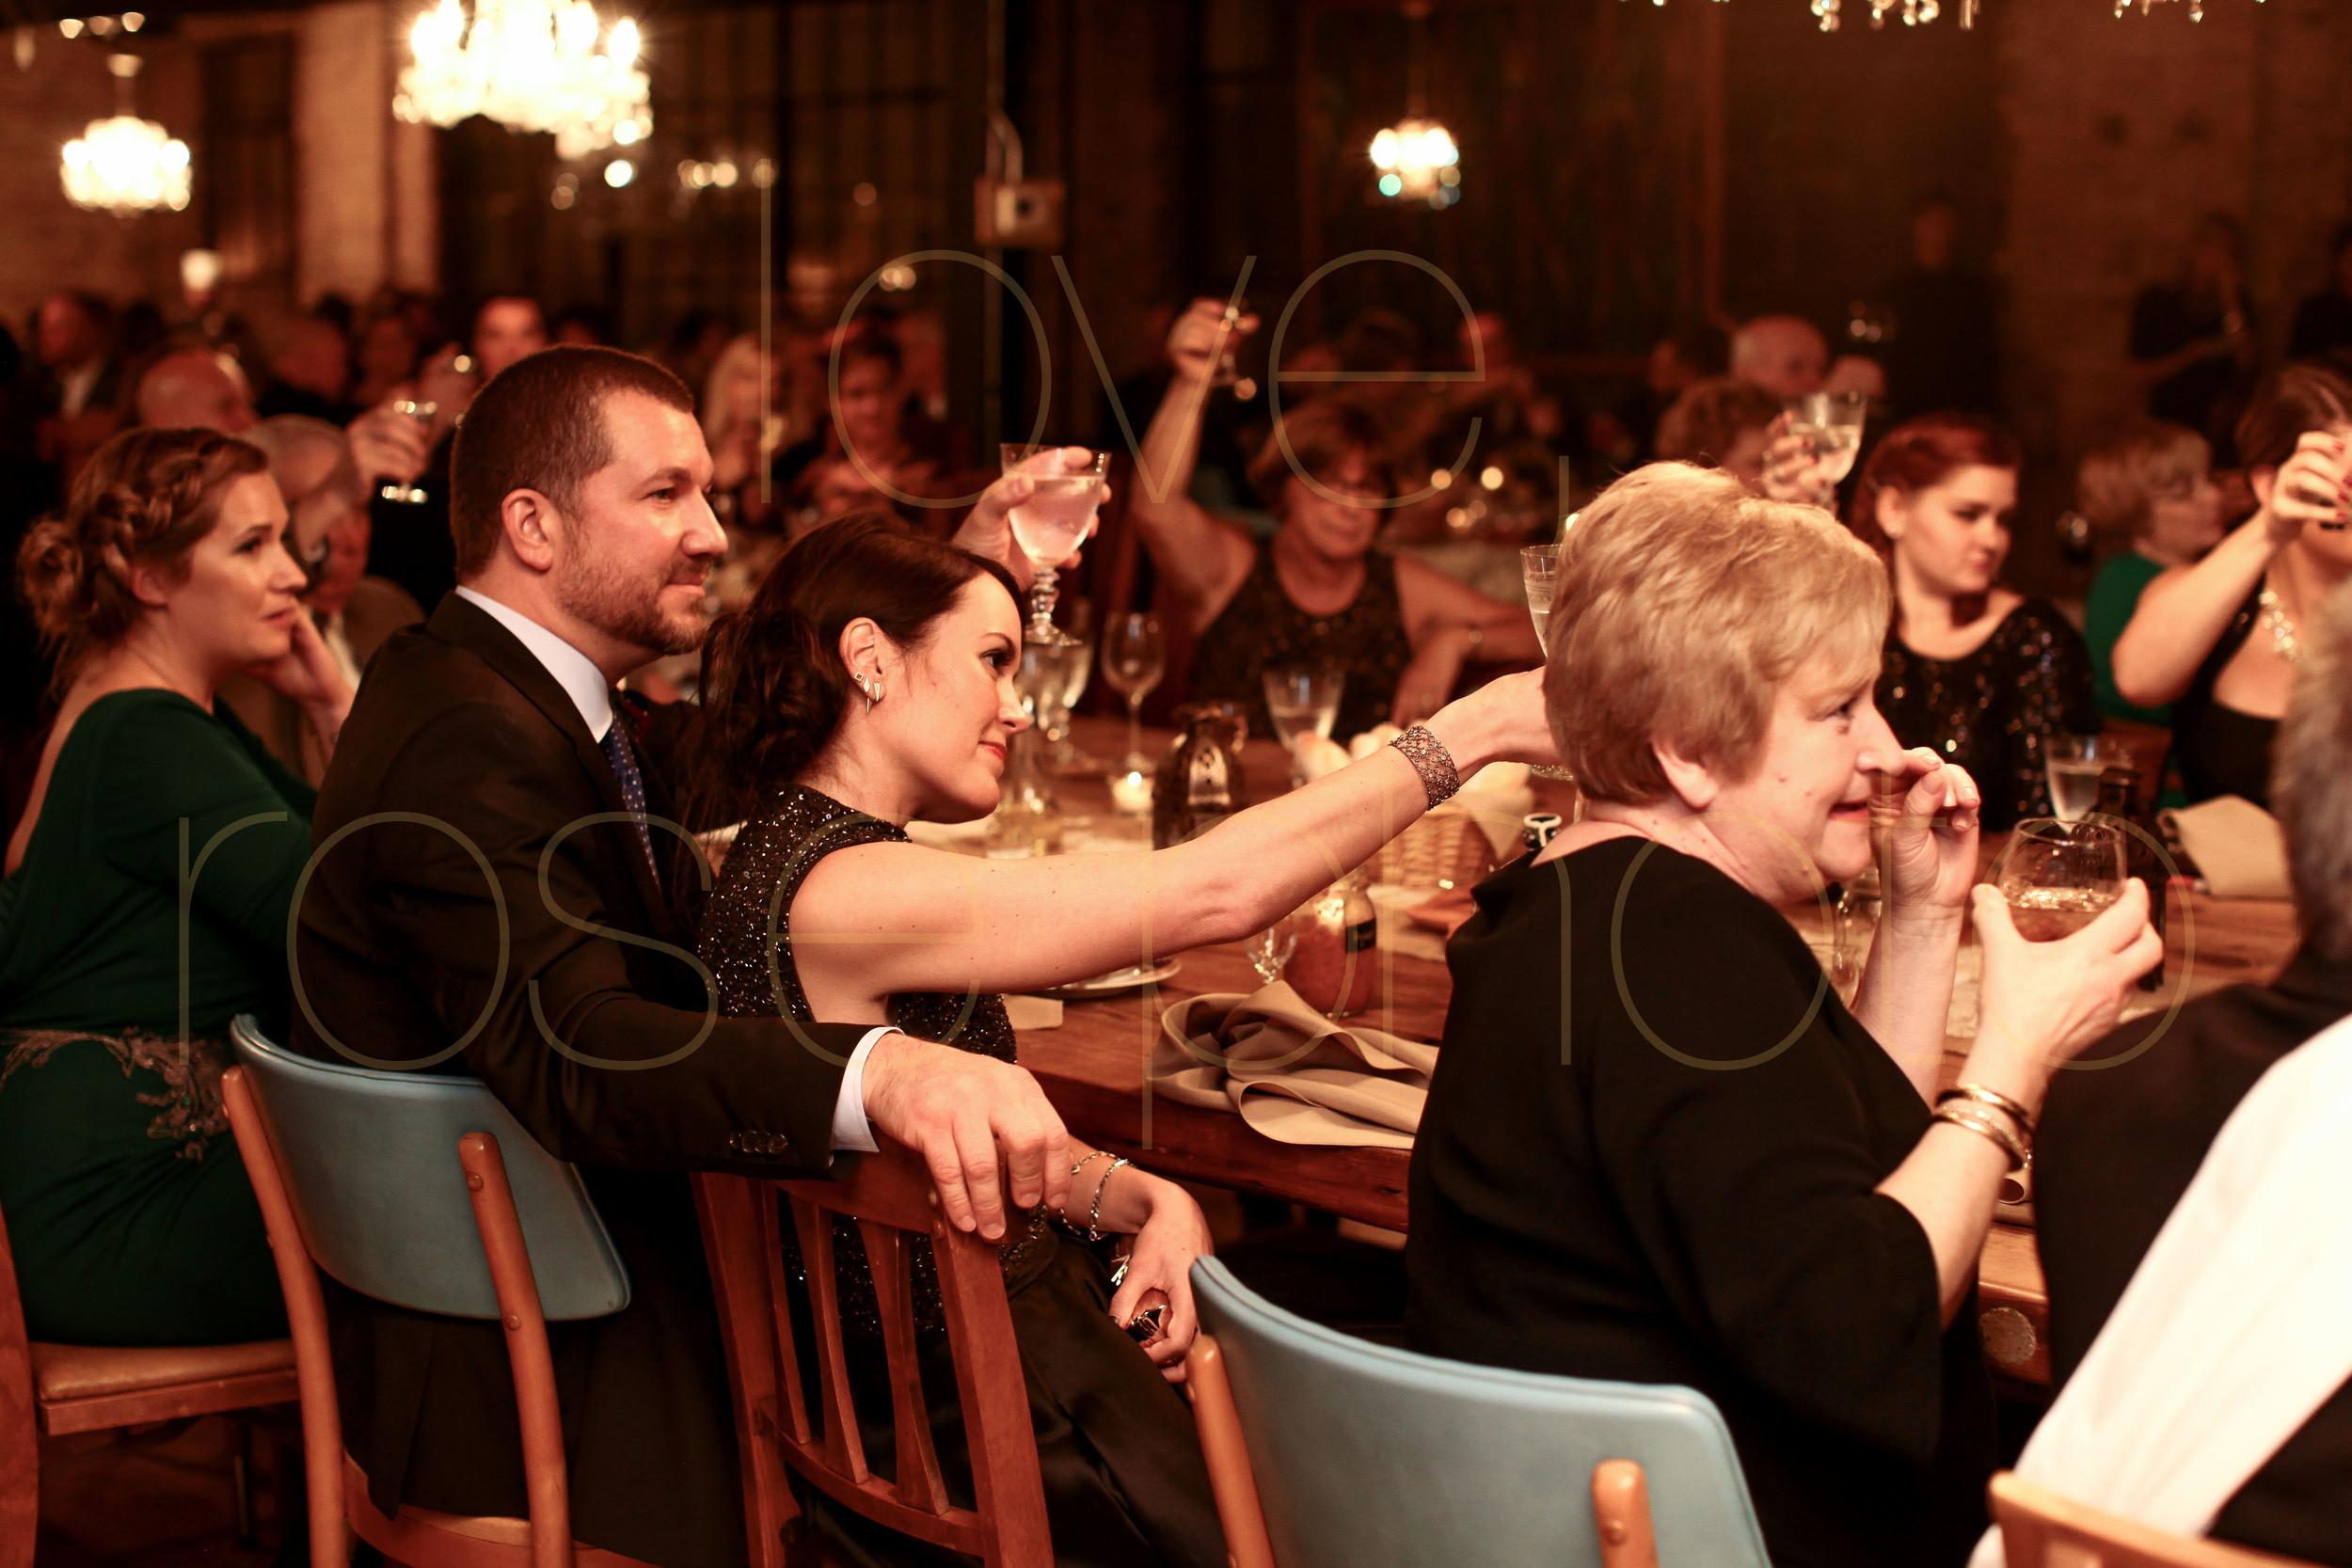 West Fulton Chicago Wedding Venue Salvage One photography enagement photos bride groom first dance-36.jpg